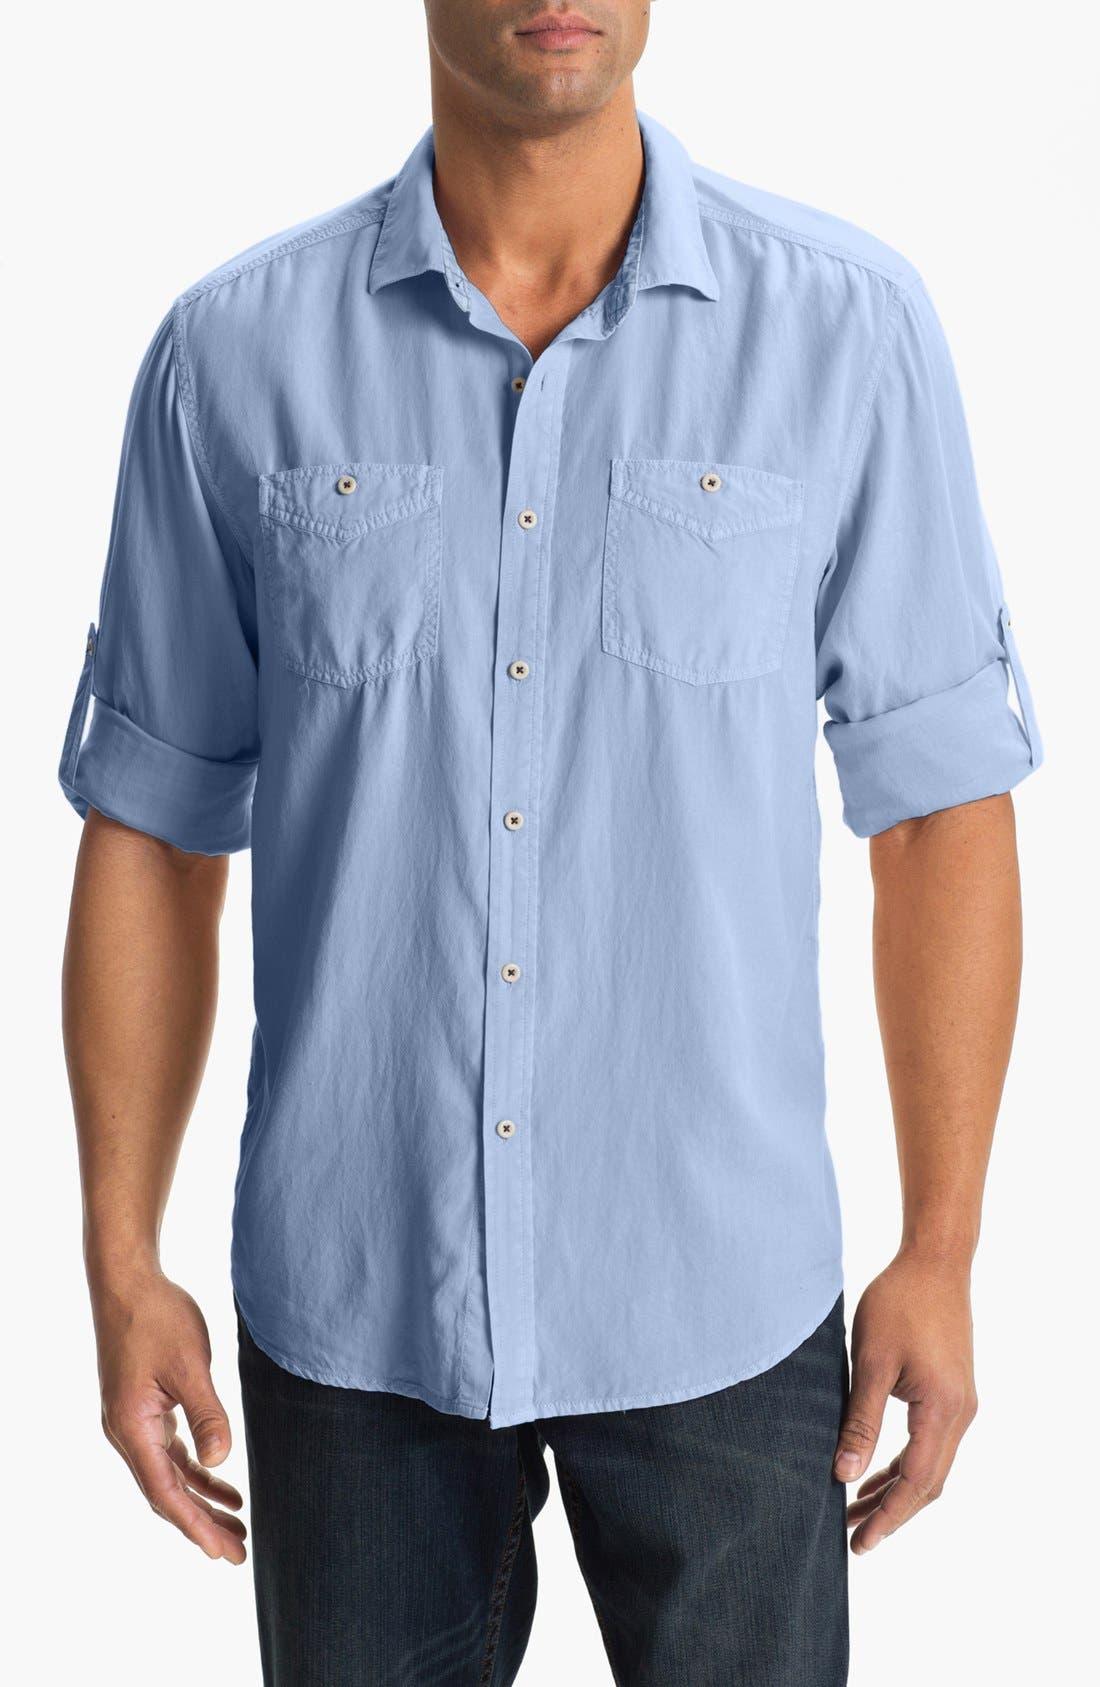 Alternate Image 1 Selected - Tommy Bahama 'Sand City' Sport Shirt (Big & Tall)